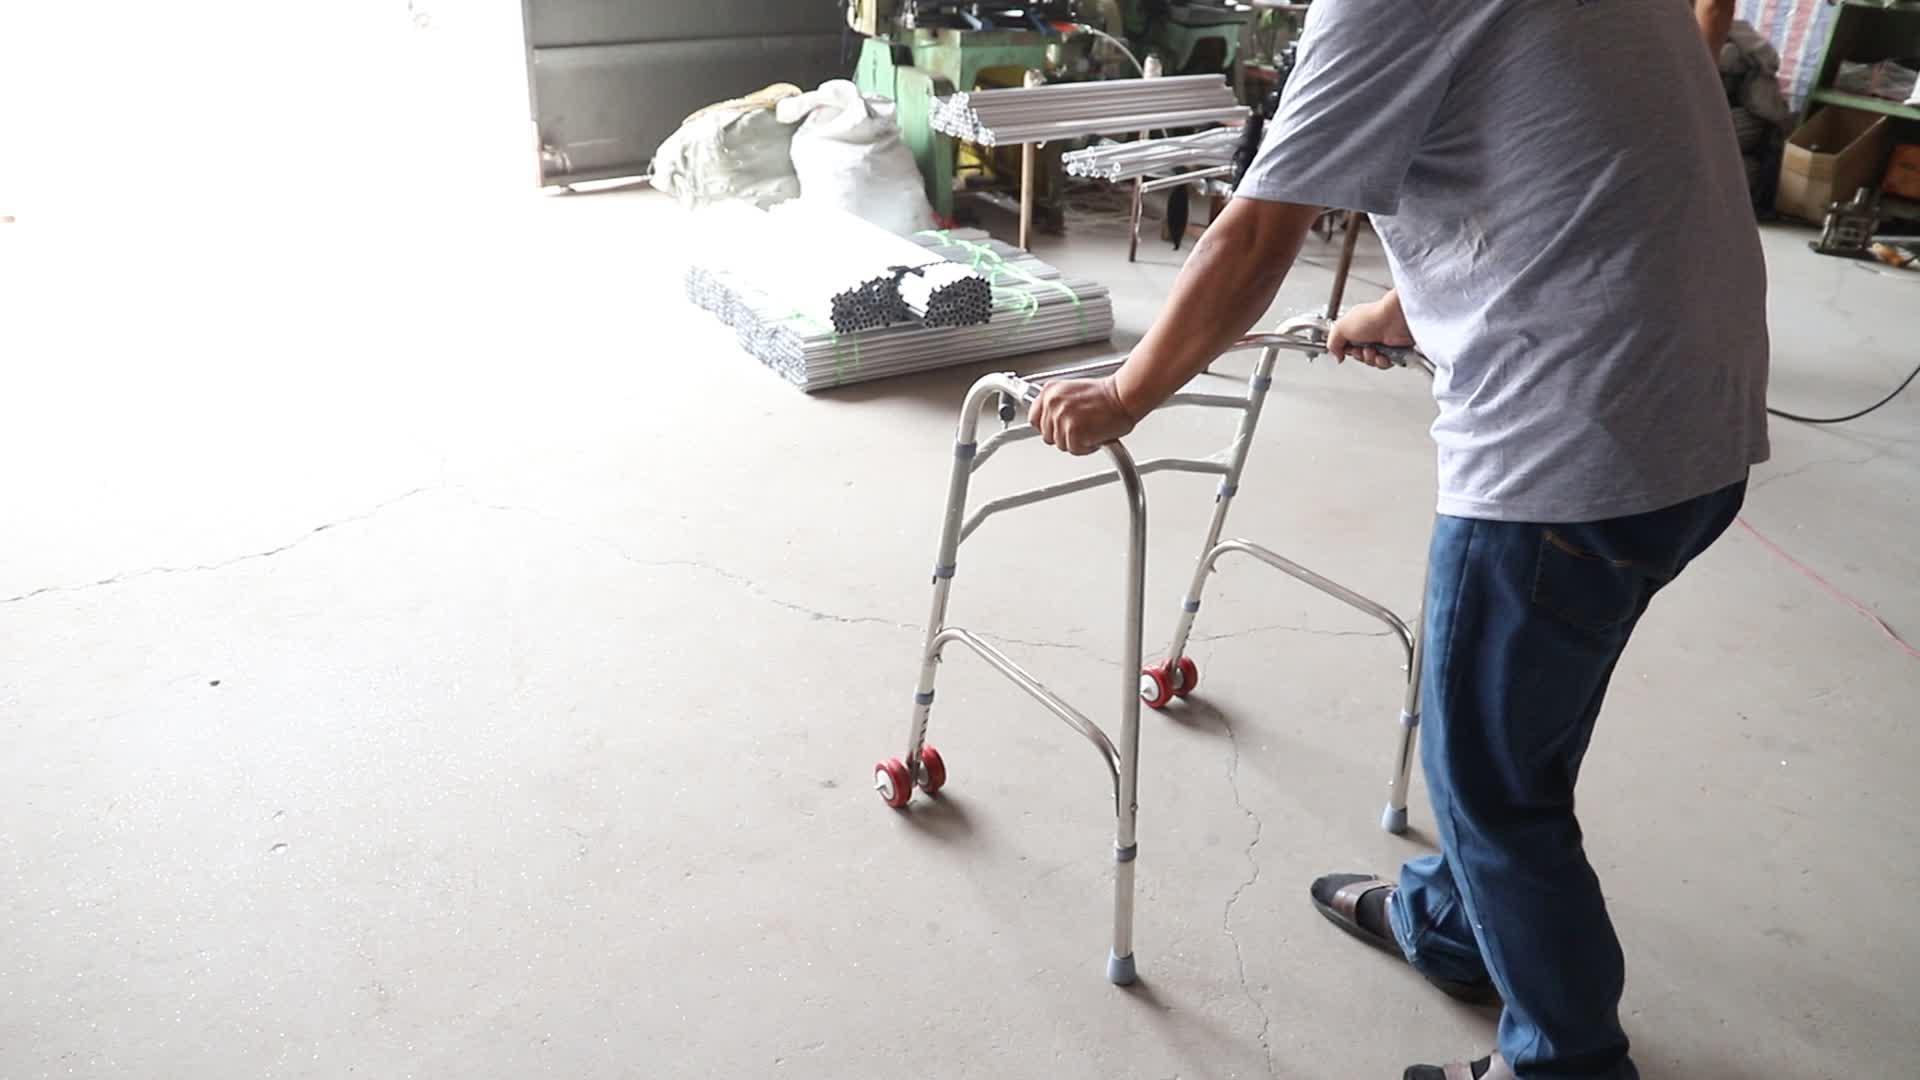 Mobility เดินเอดส์ผู้ใหญ่ Walker